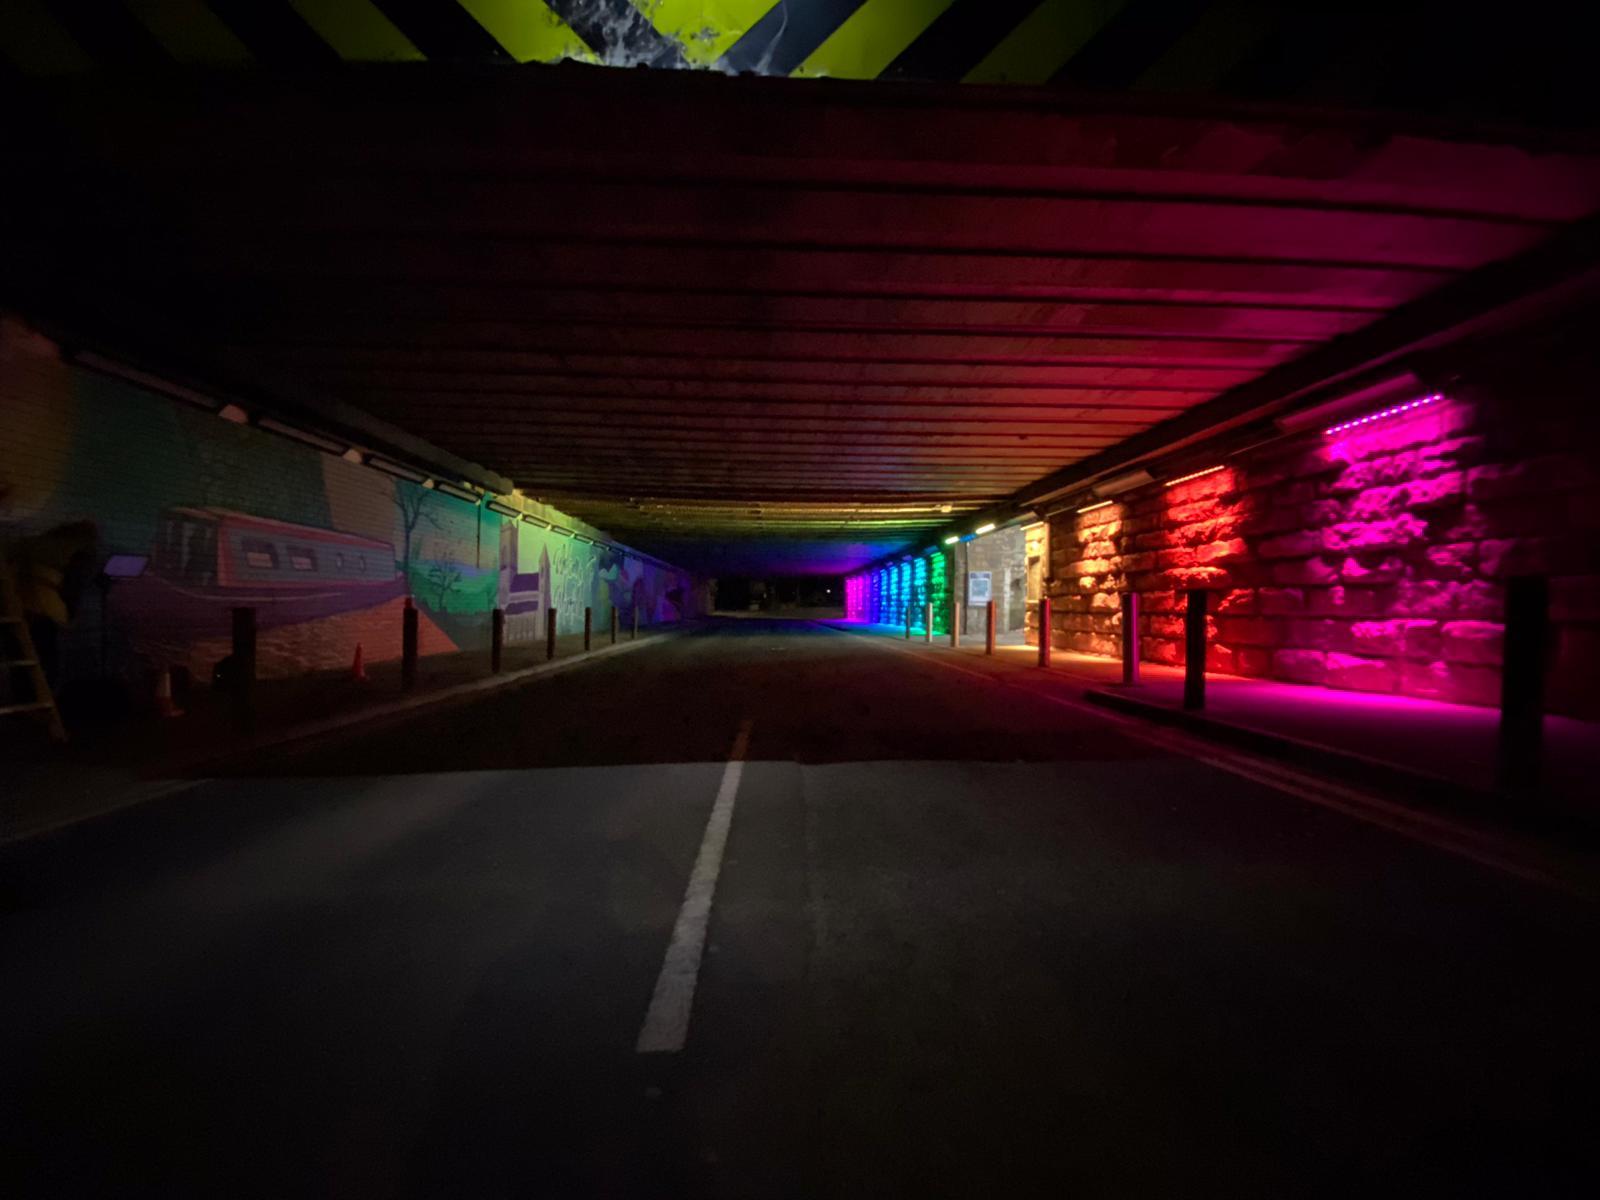 Mirfield underpass lighting